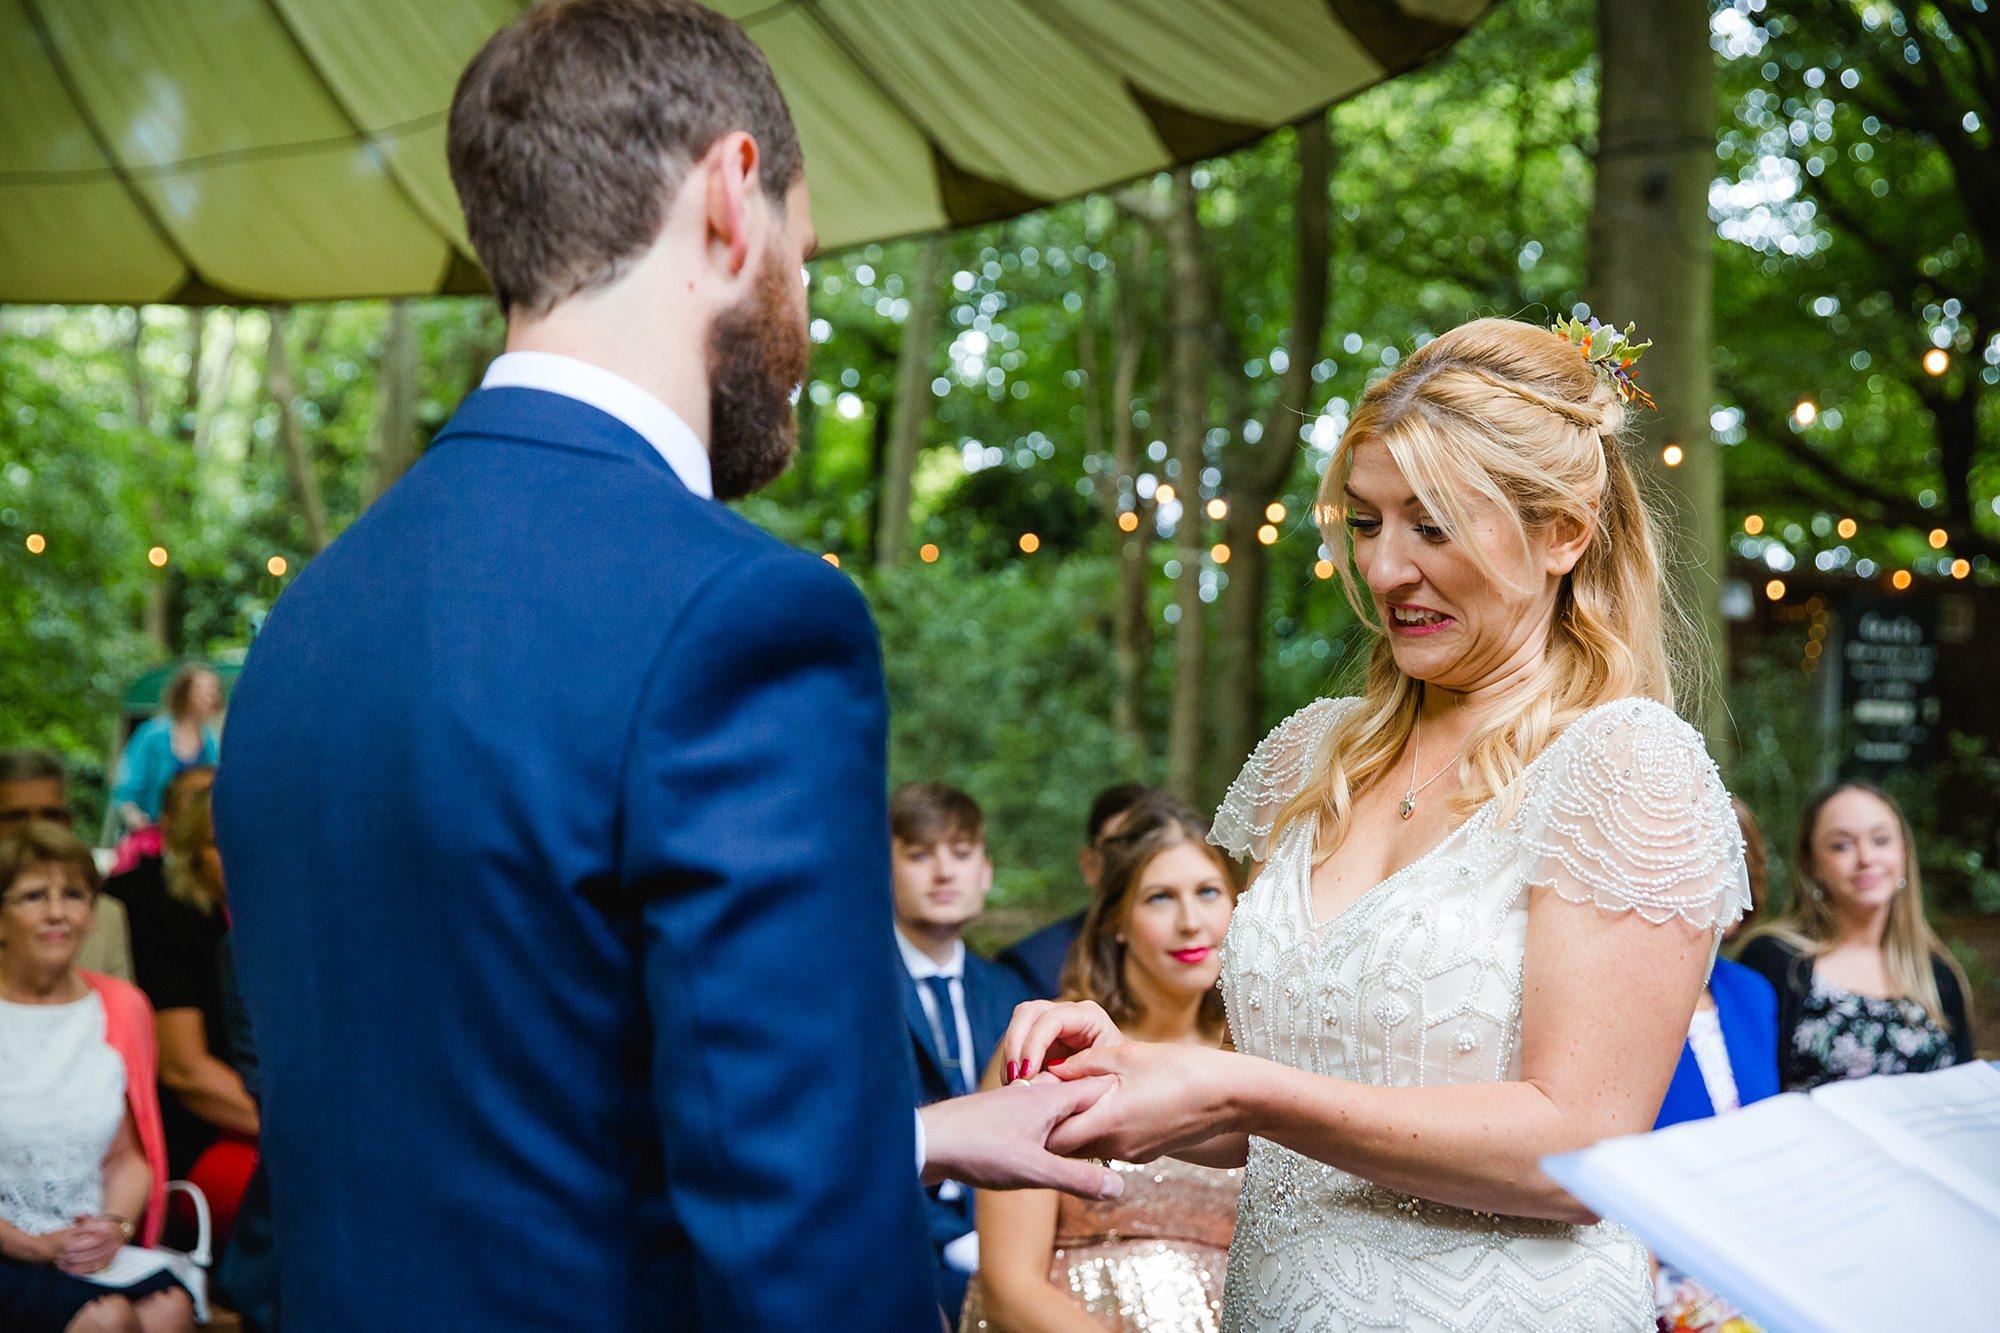 Woodland Weddings Tring bride putting on ring